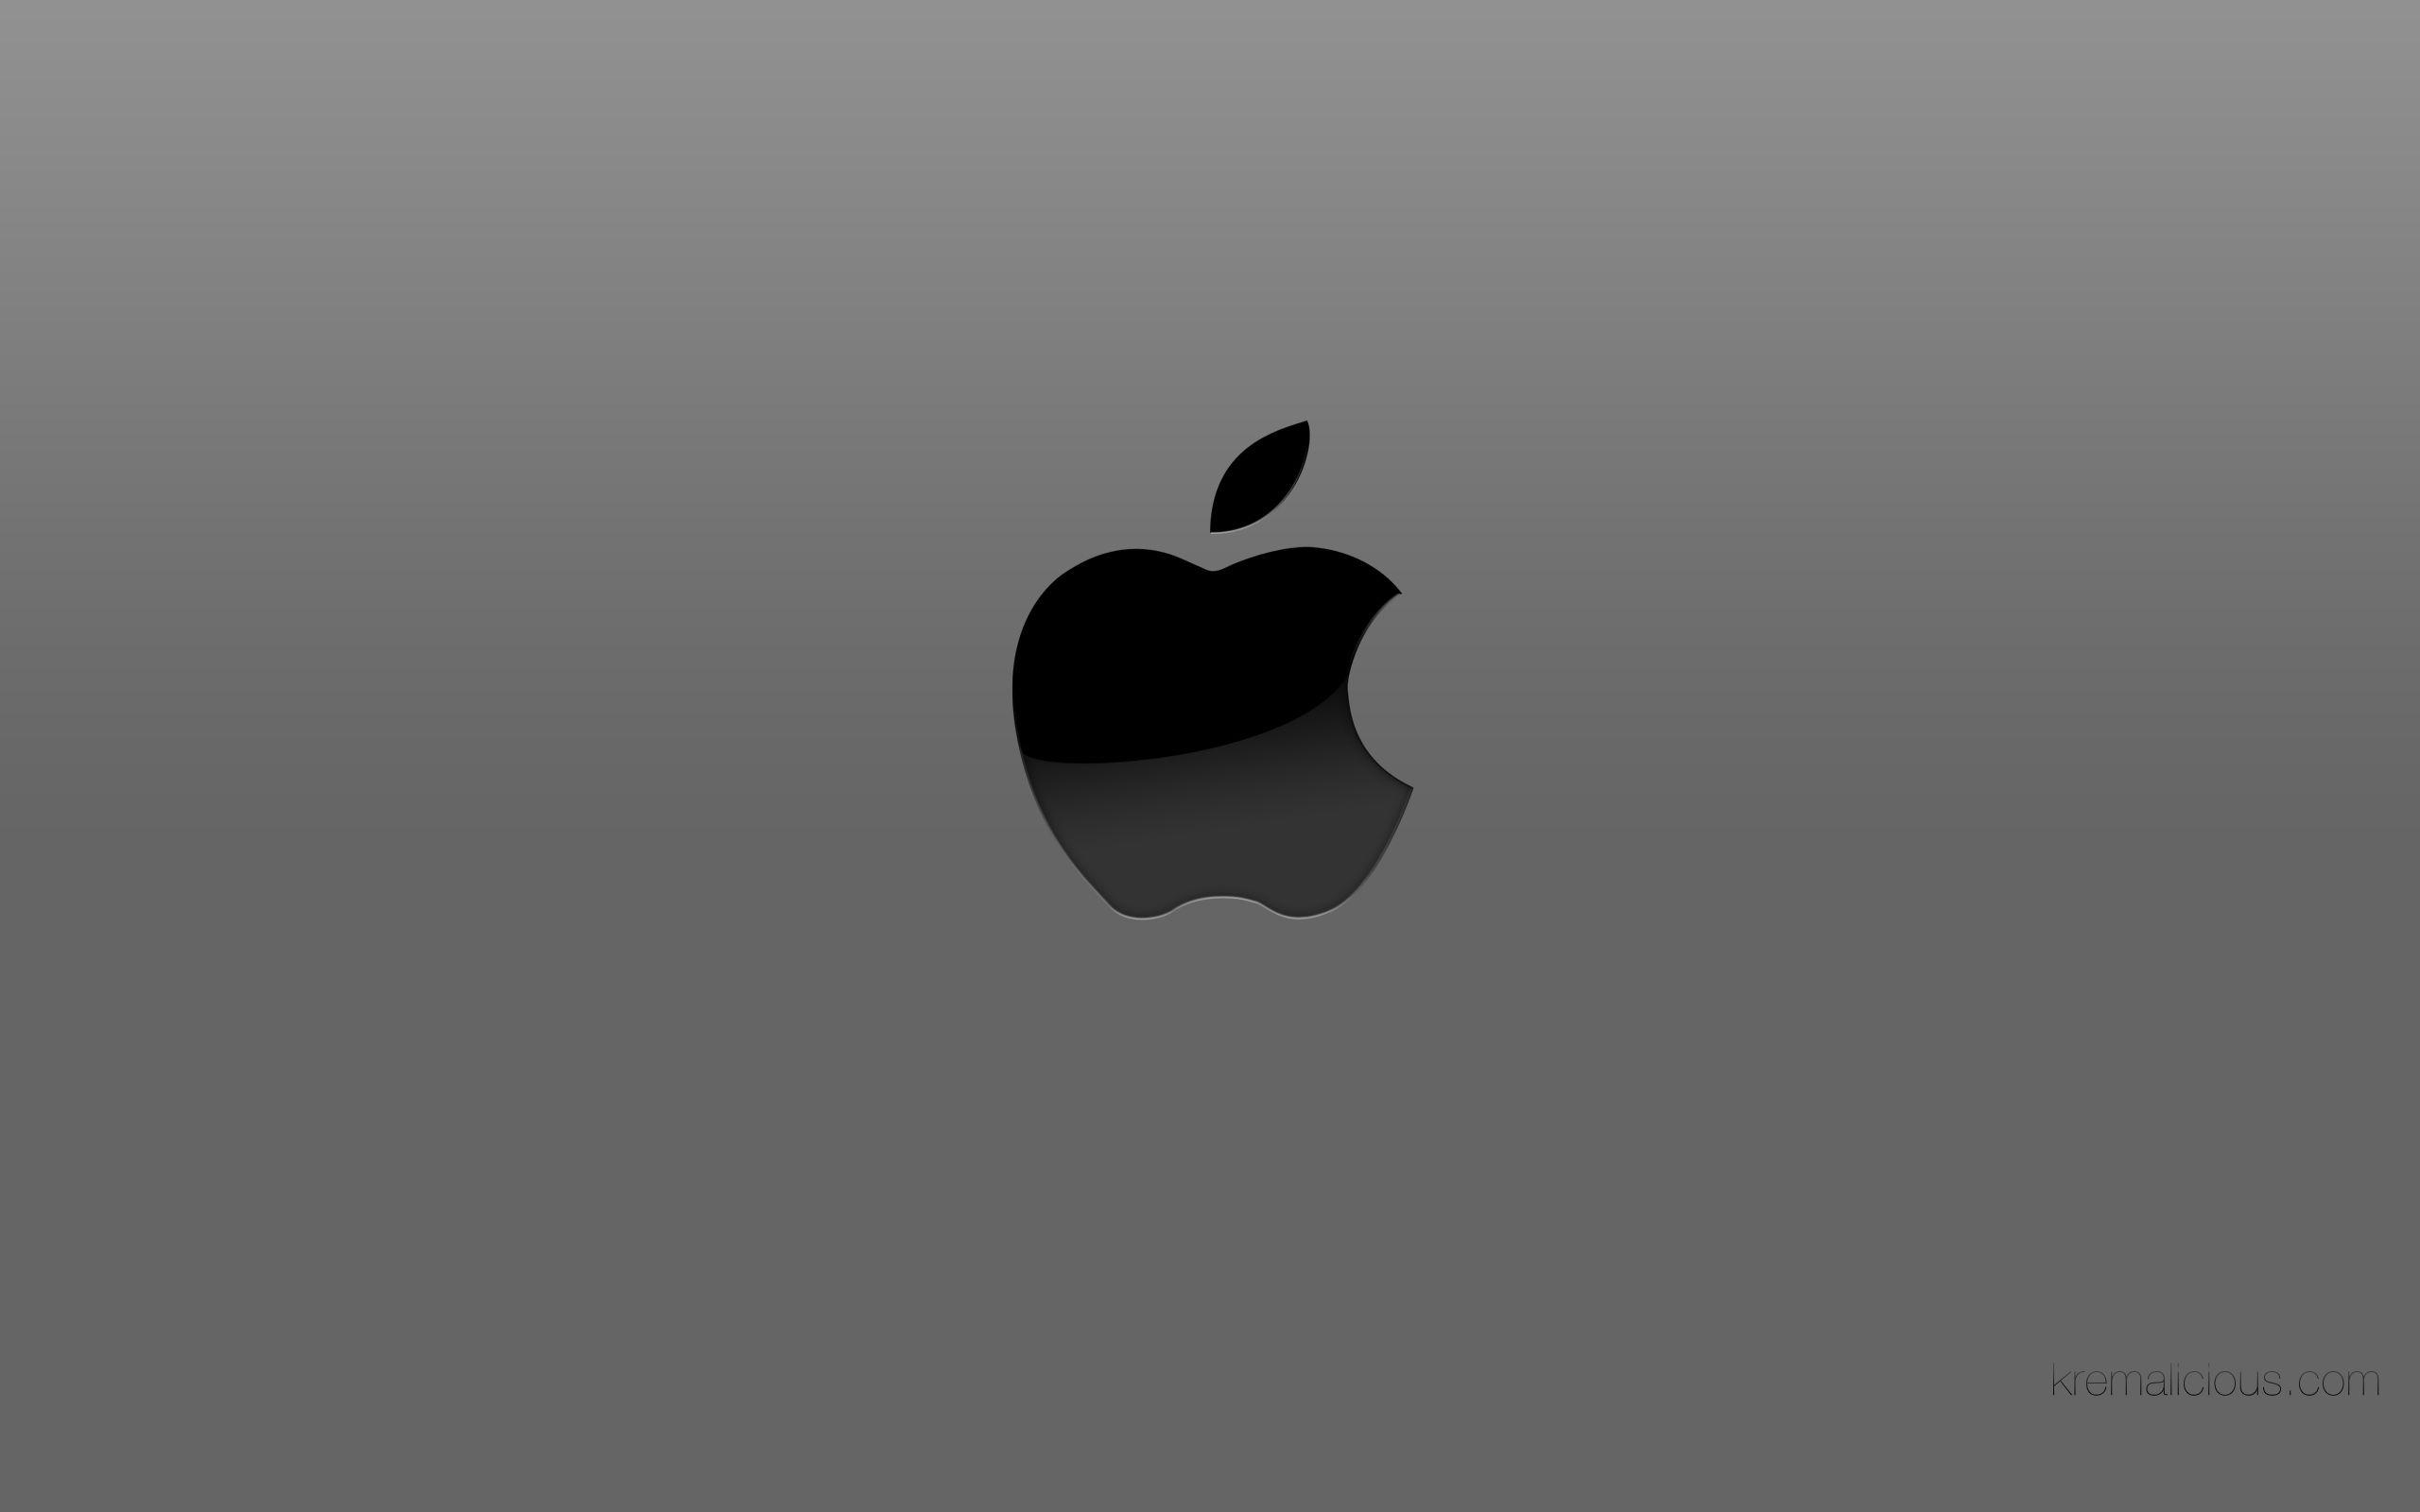 cool apple logo wallpaper #1